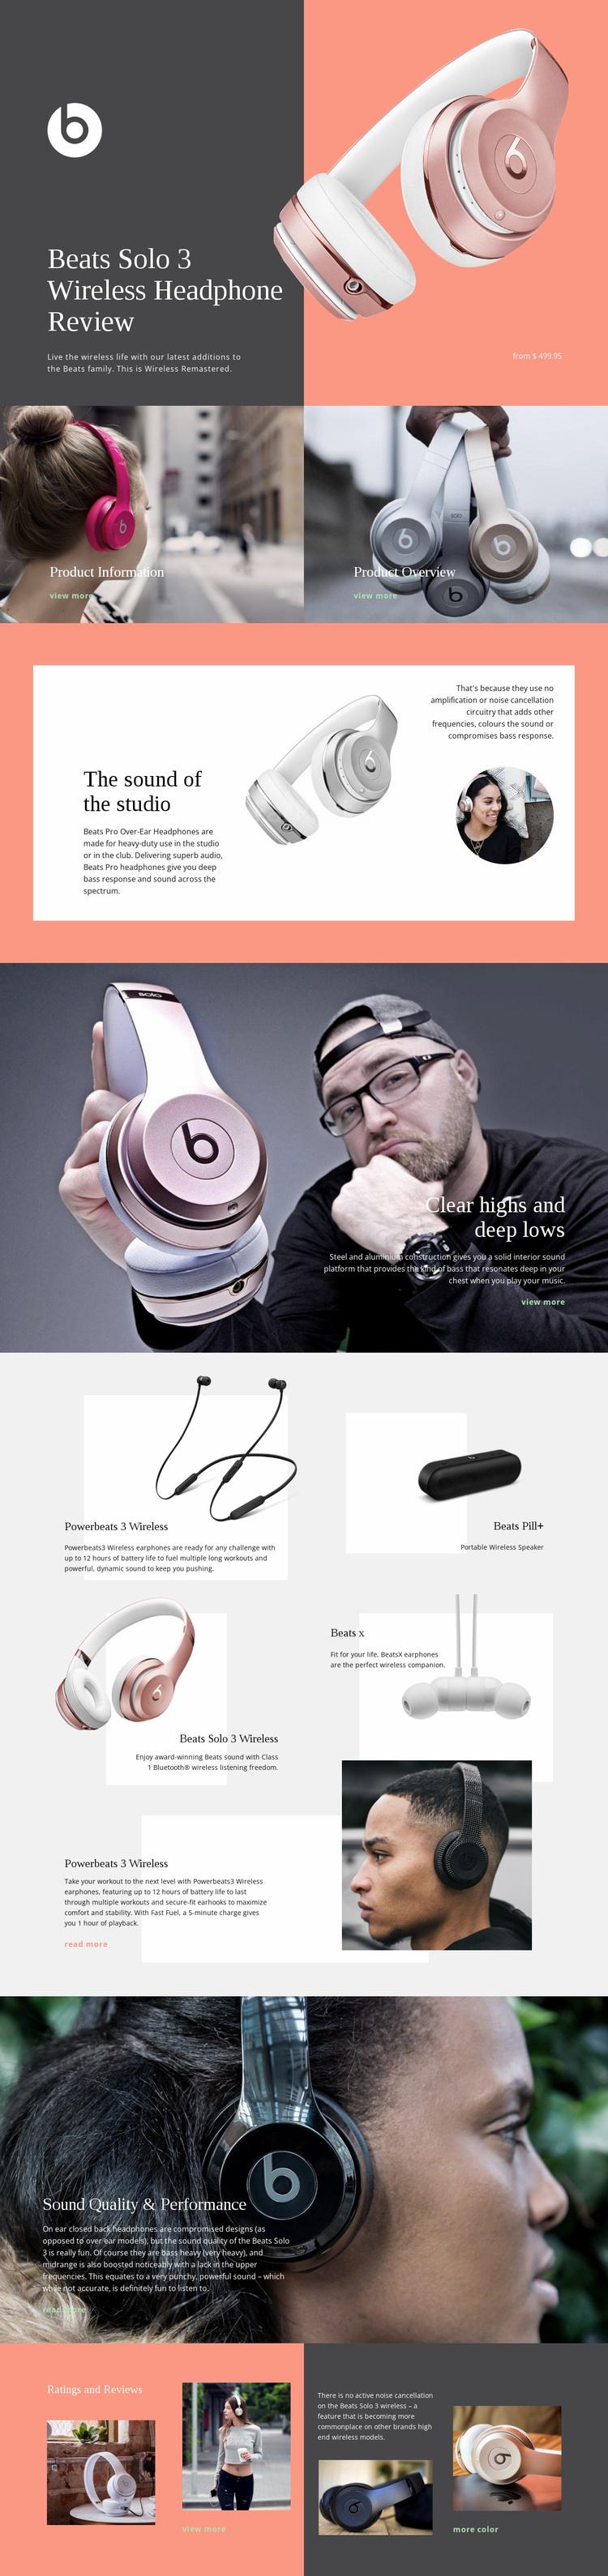 Beats Wireless Website Design